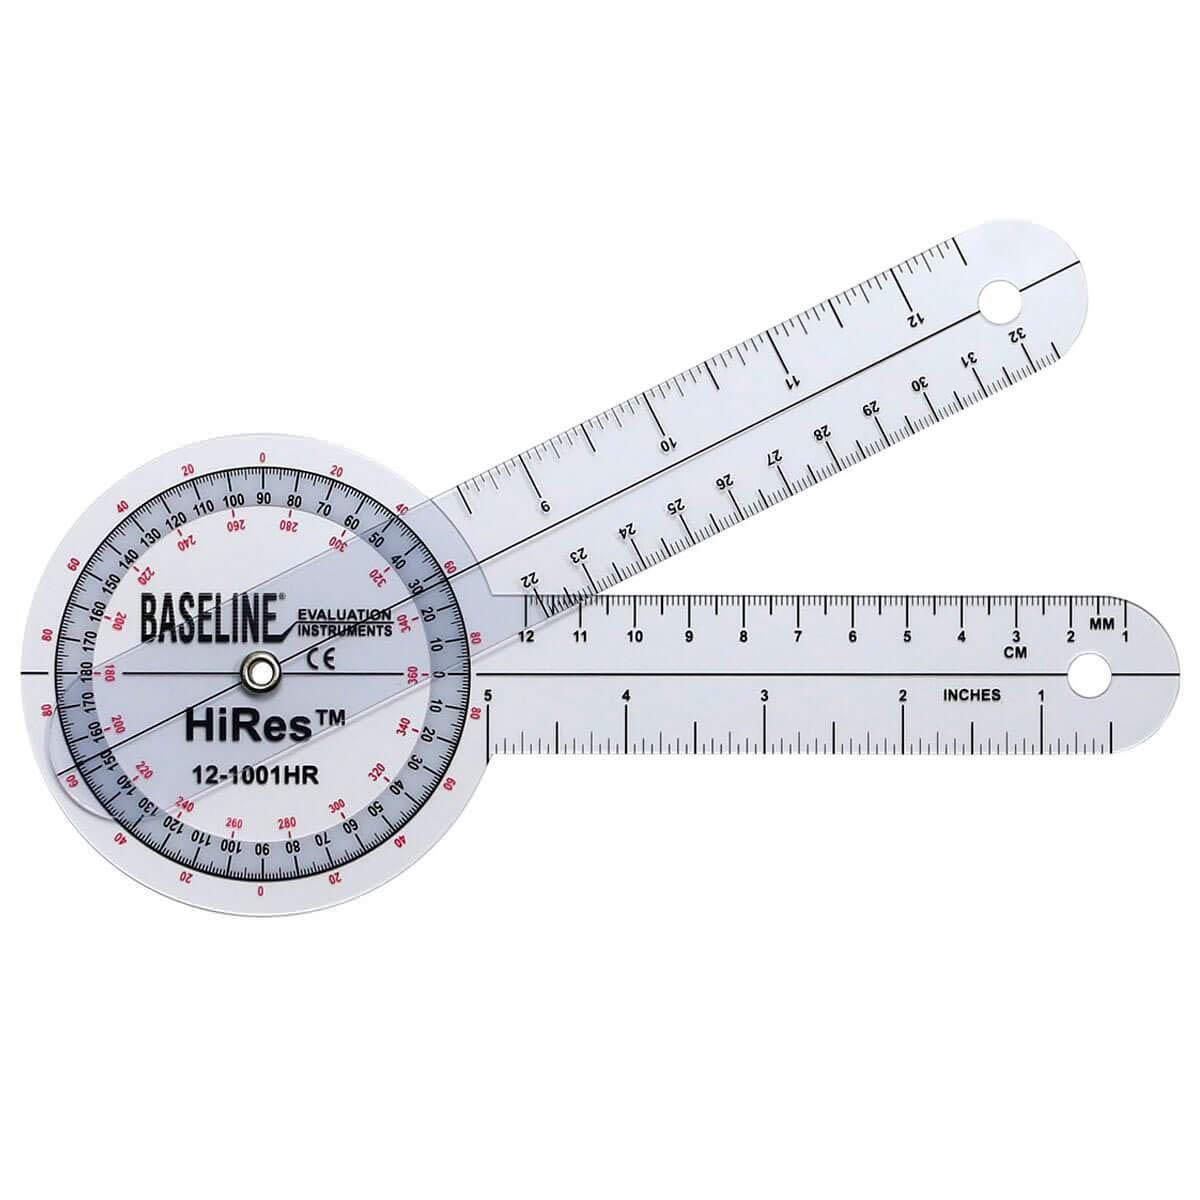 Baseline Hires 360 Degree Transparent Plastic Goniometer